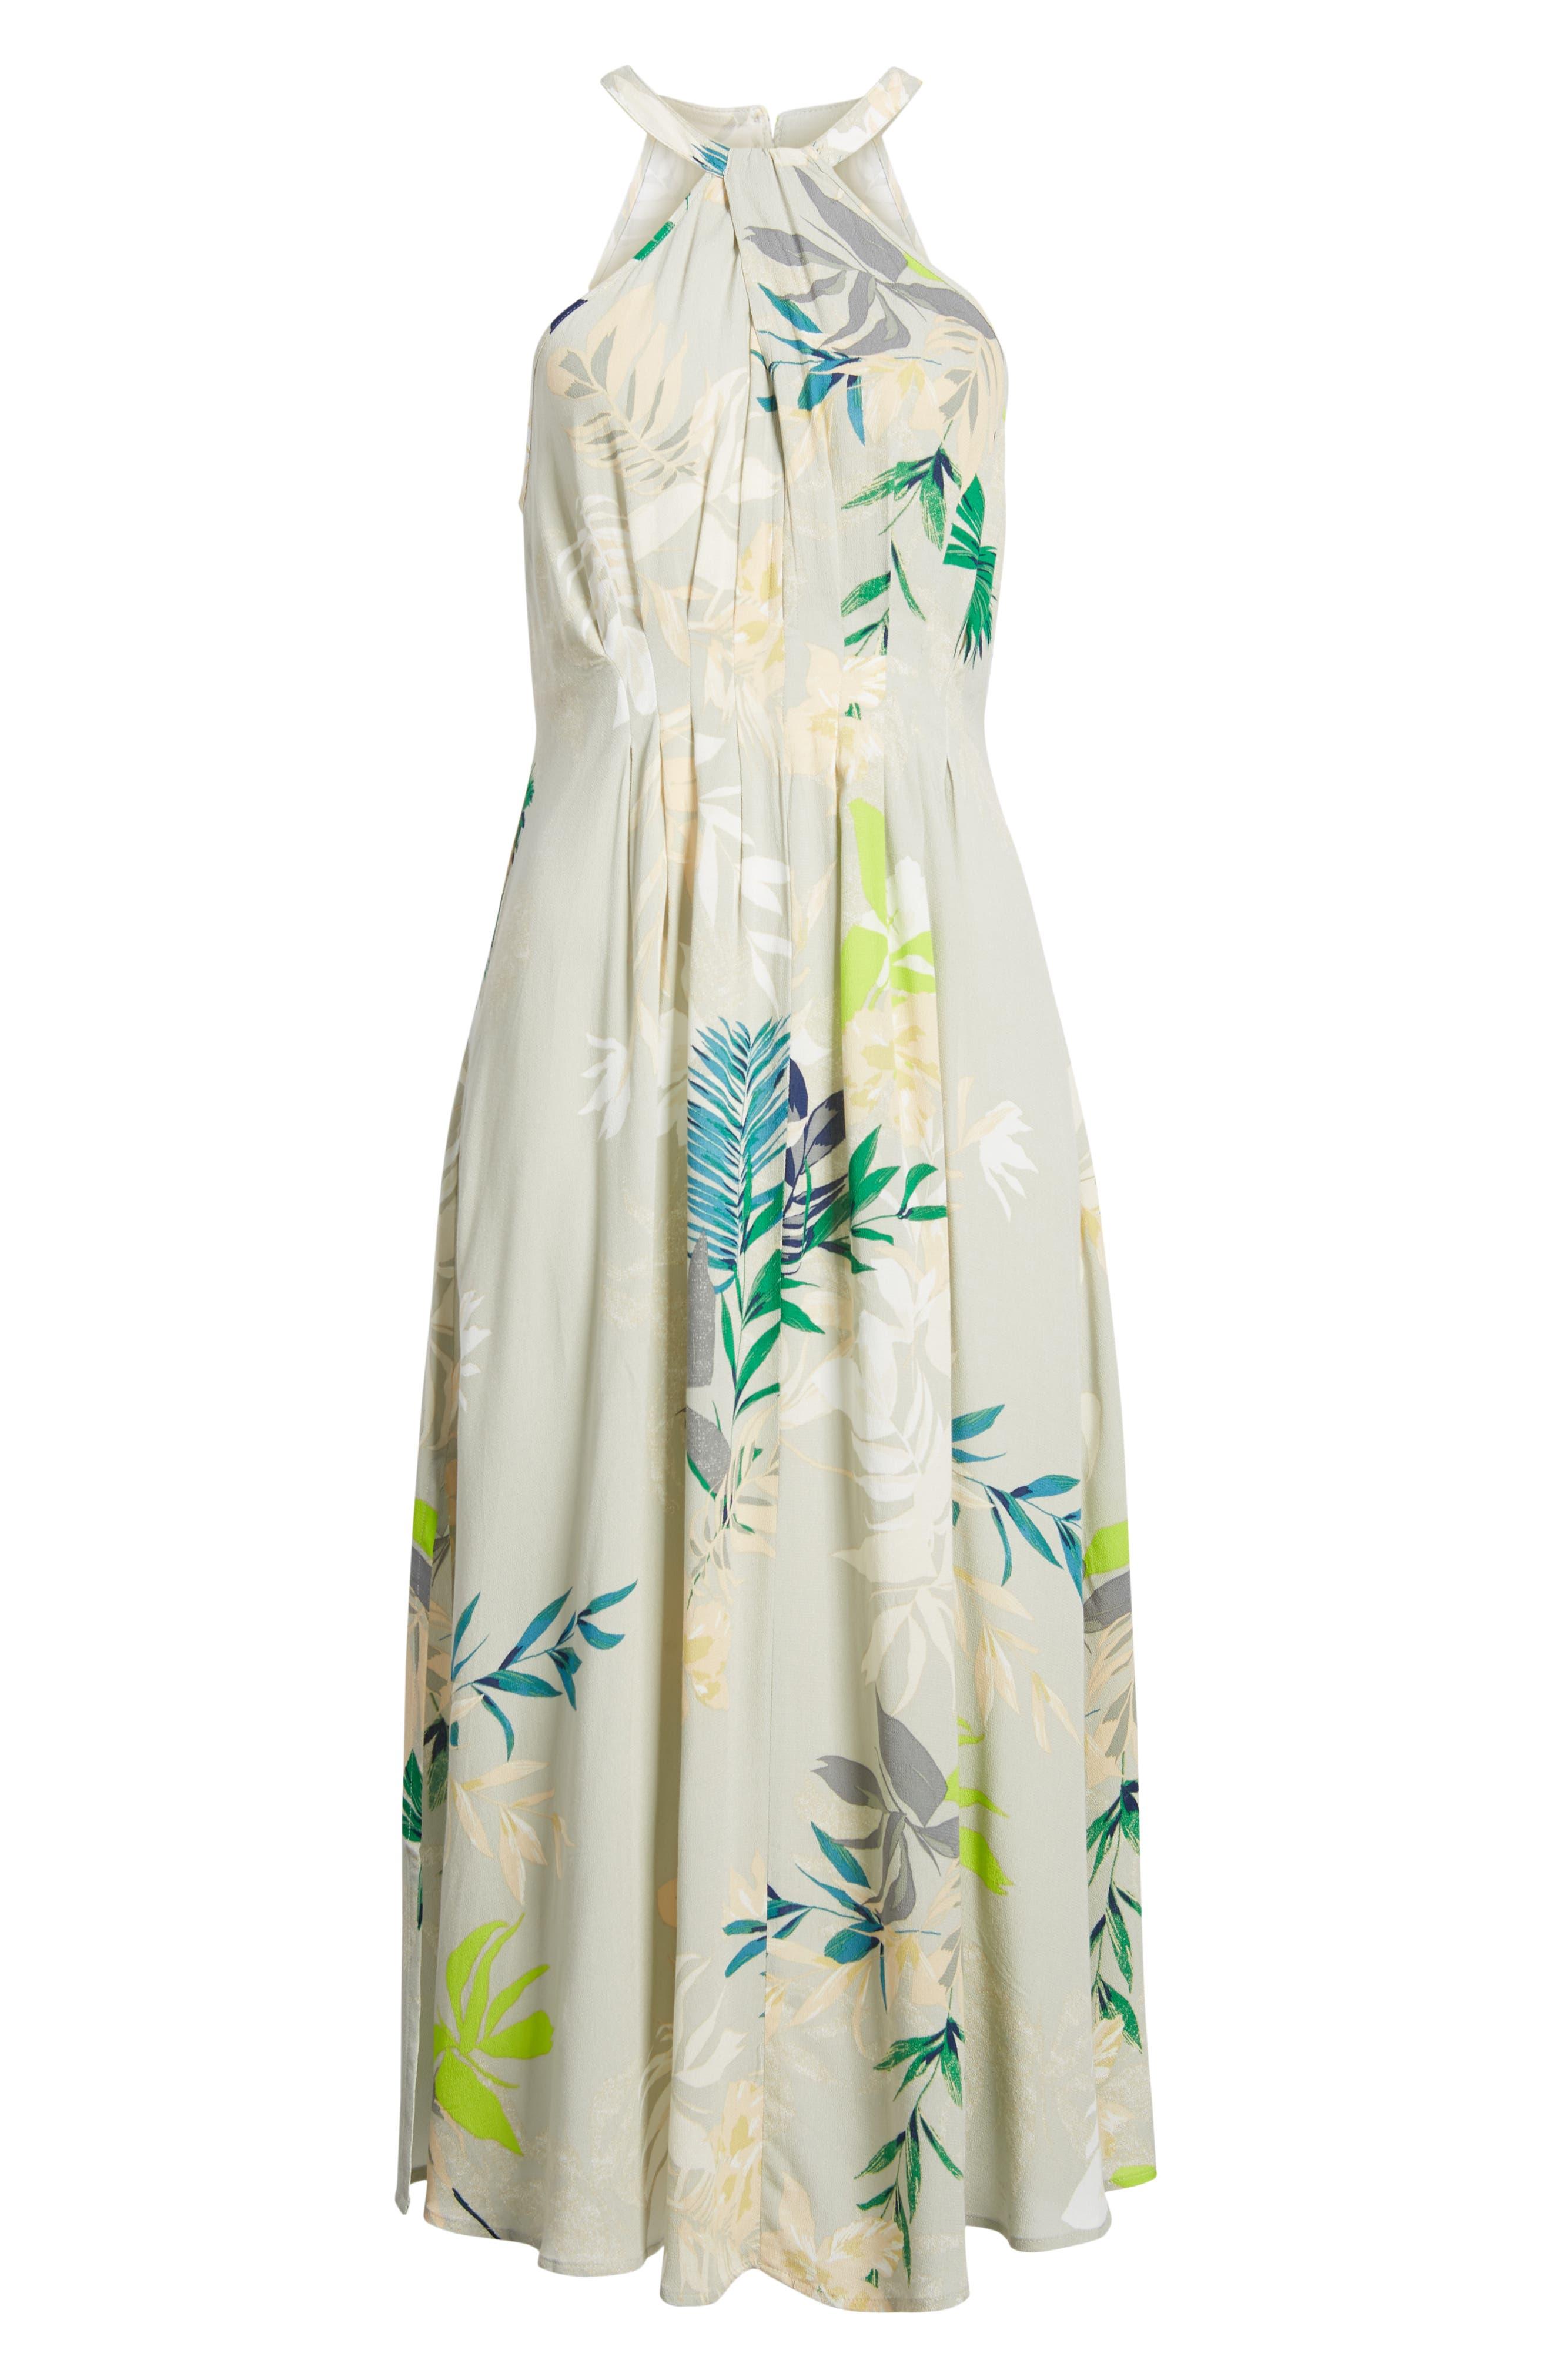 Byronne Floral Print Woven Midi Dress,                             Alternate thumbnail 4, color,                             MULTI COLORED